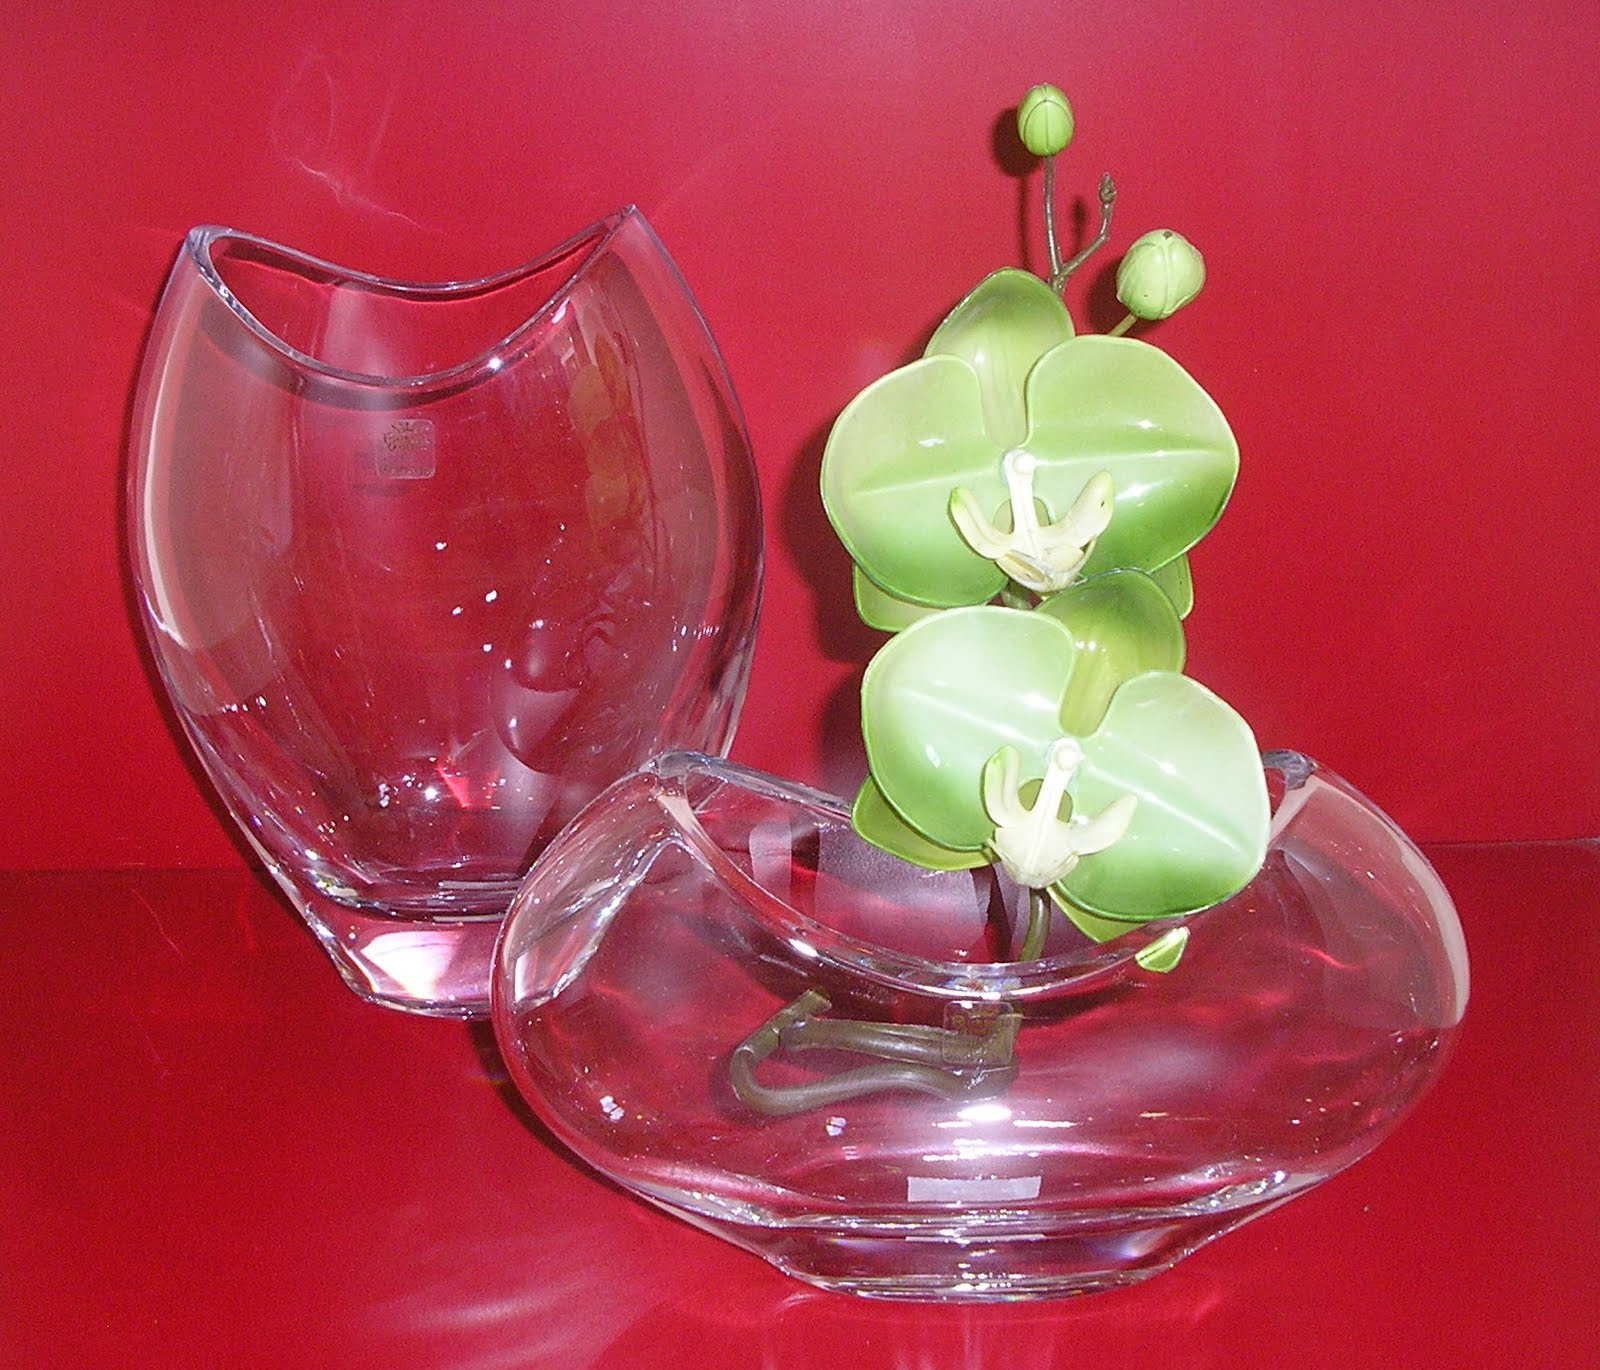 Vasi arredamento moderno trendy vasi per interni design for Vasi di arredamento da interni